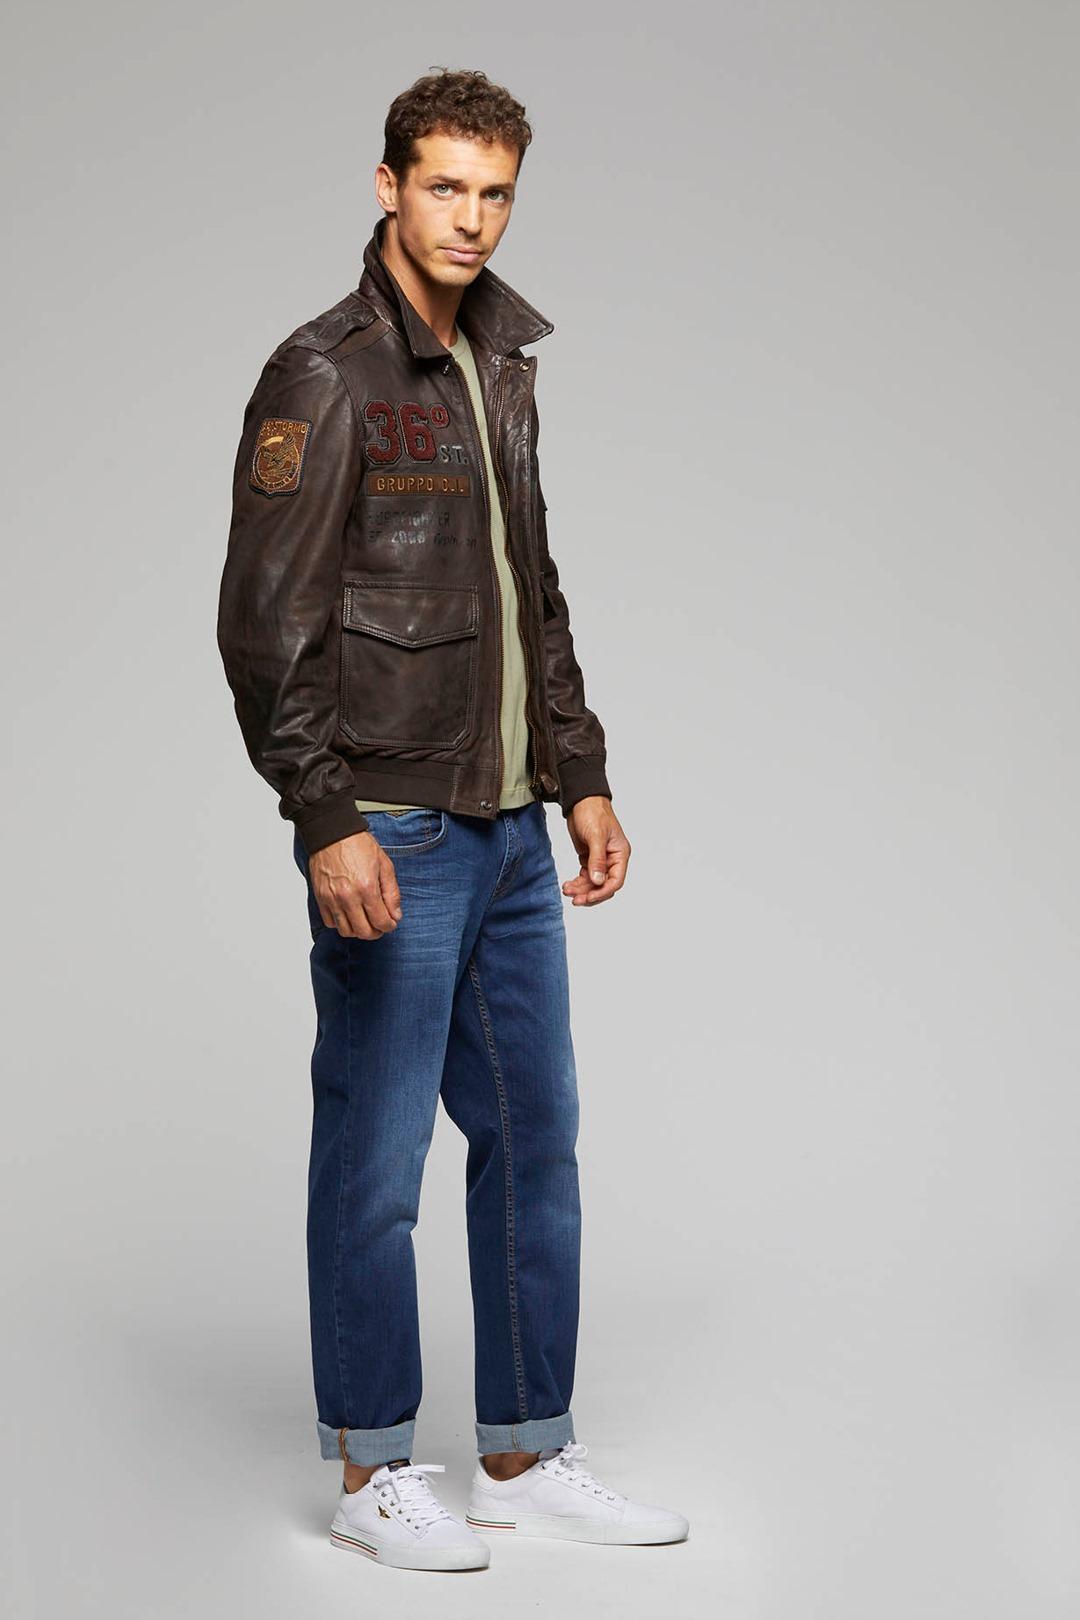 Printed Leather Jacket                        4